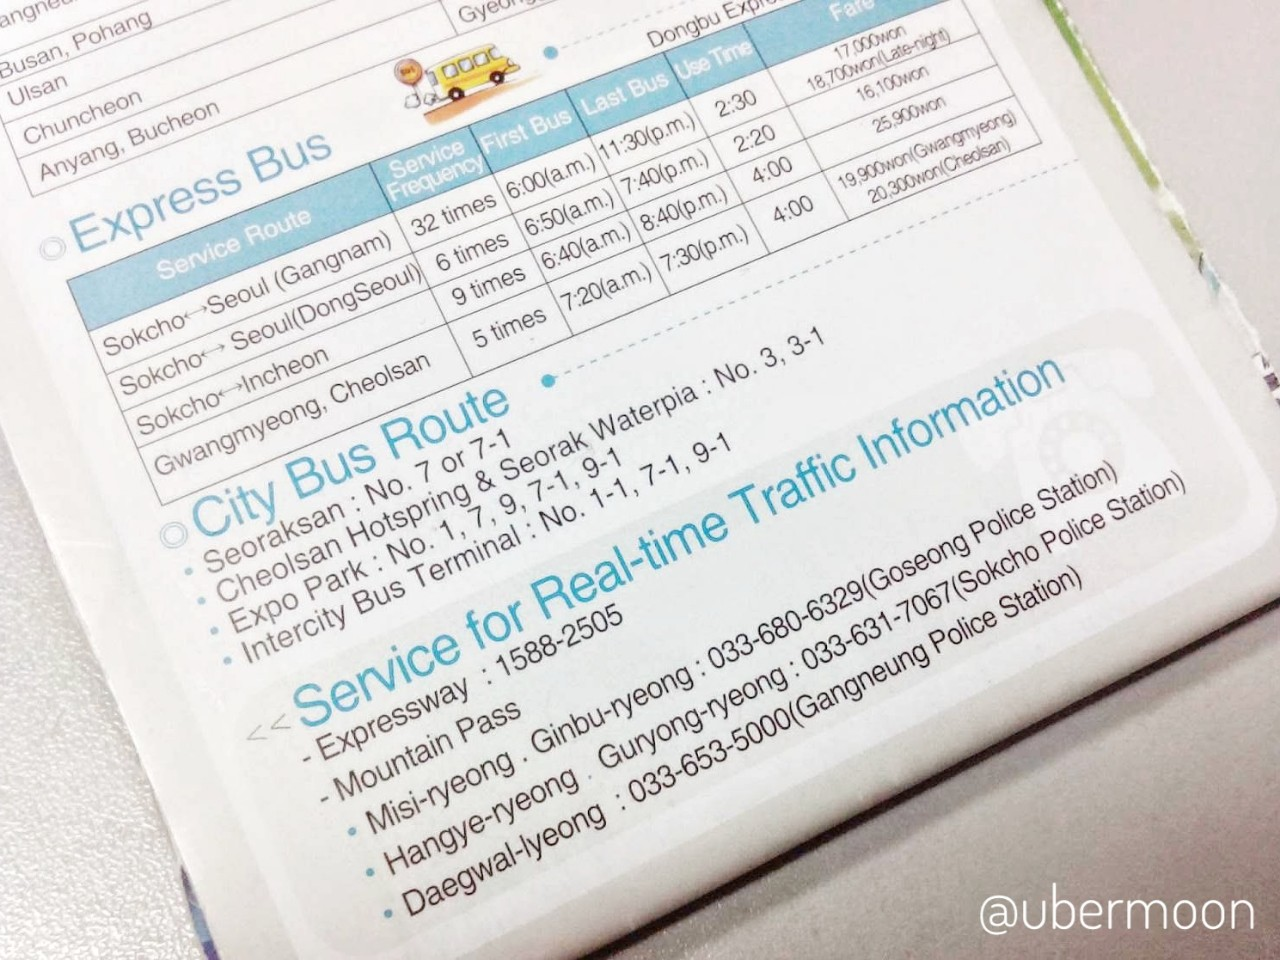 Jadwal Bus di Sokcho